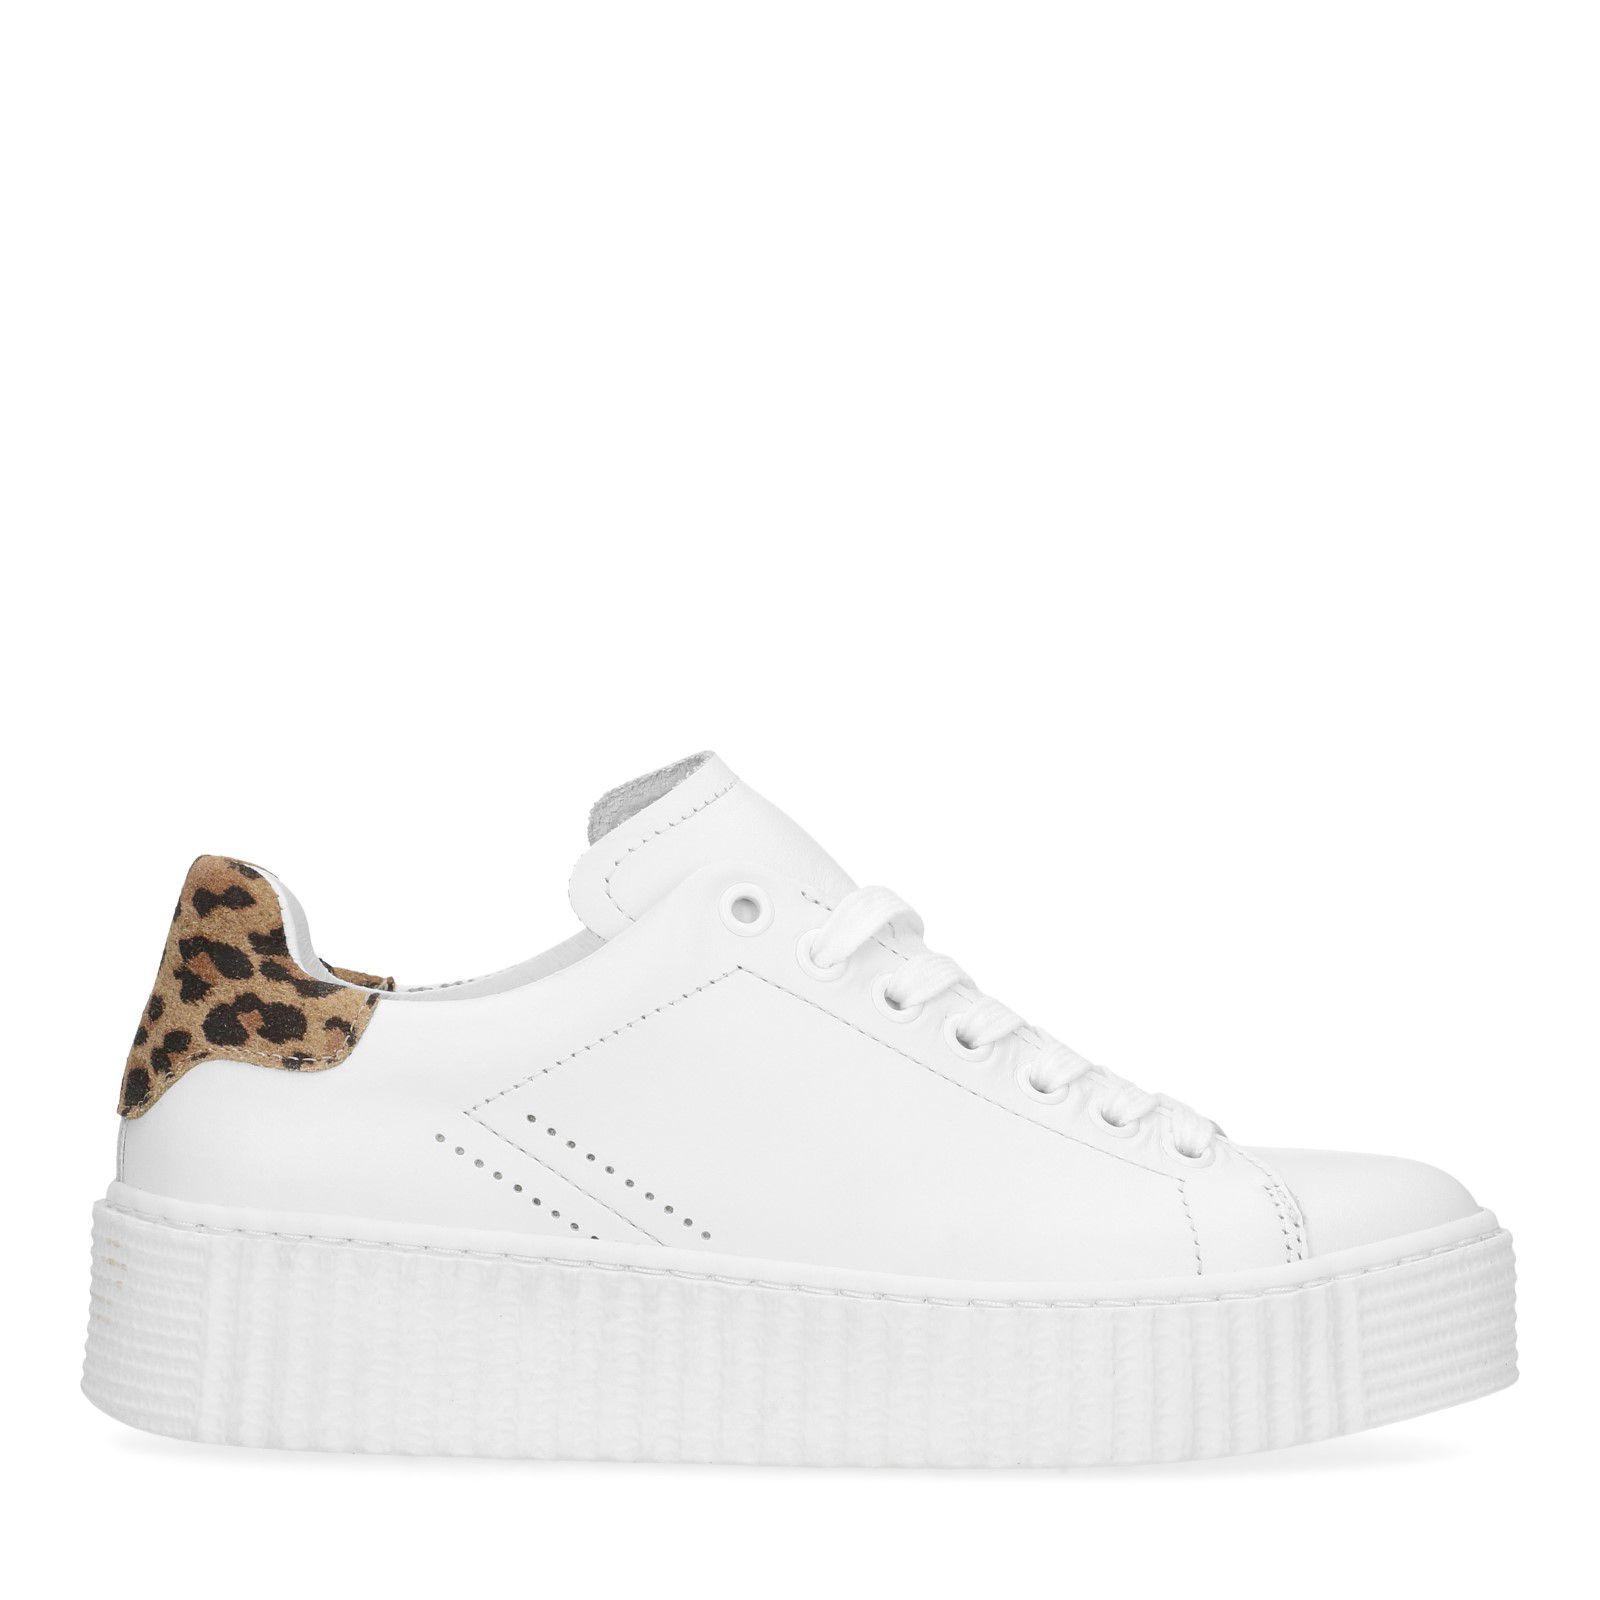 leren sneakers dames wit met printje